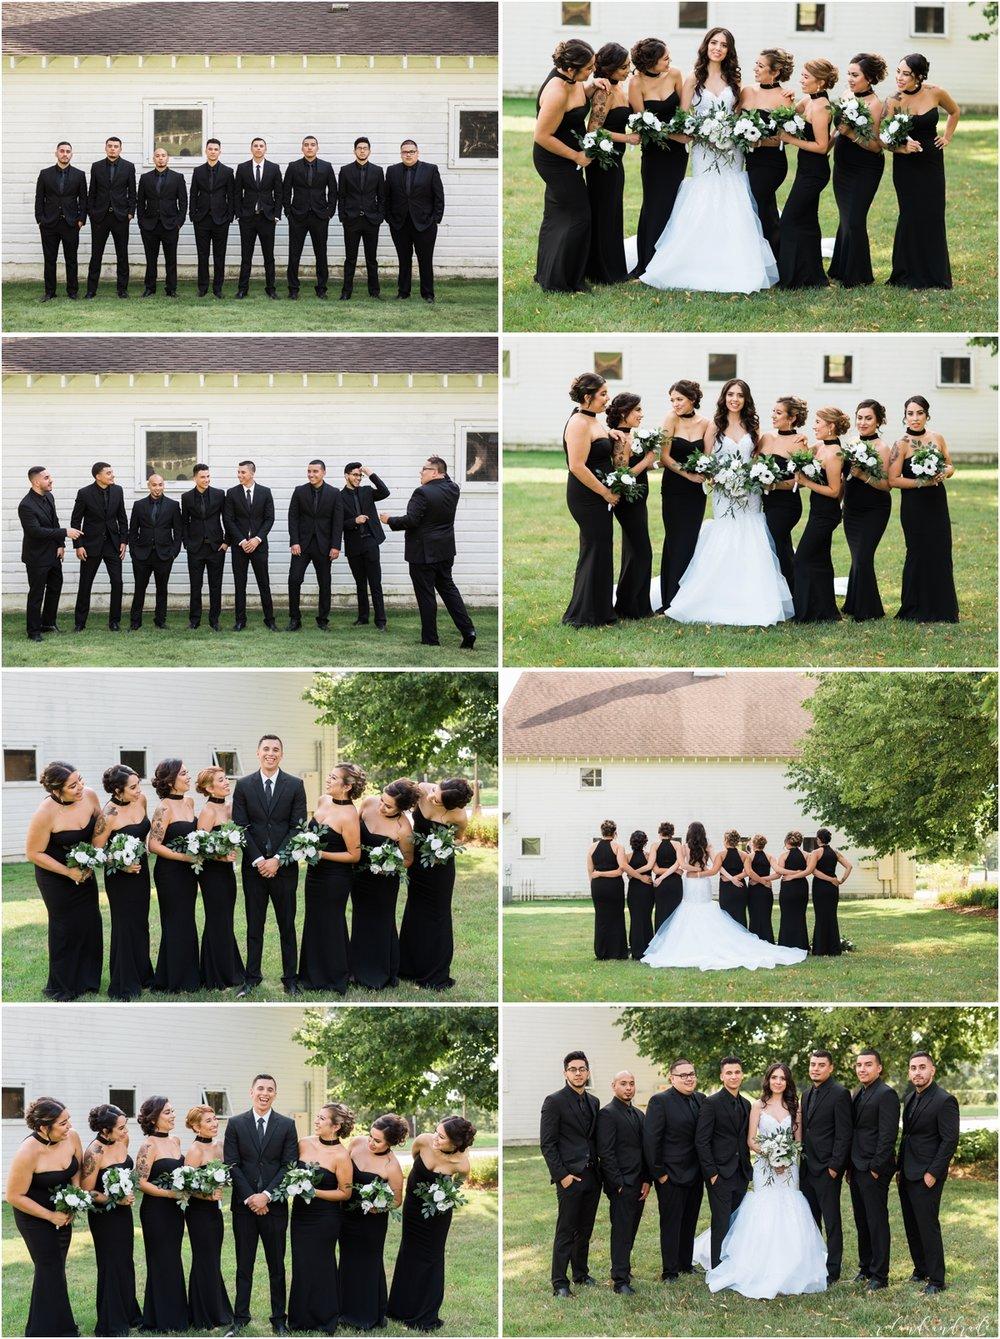 Danada House Wedding Photography Wheaton Illinois - Chicago Wedding Photography_0056.jpg